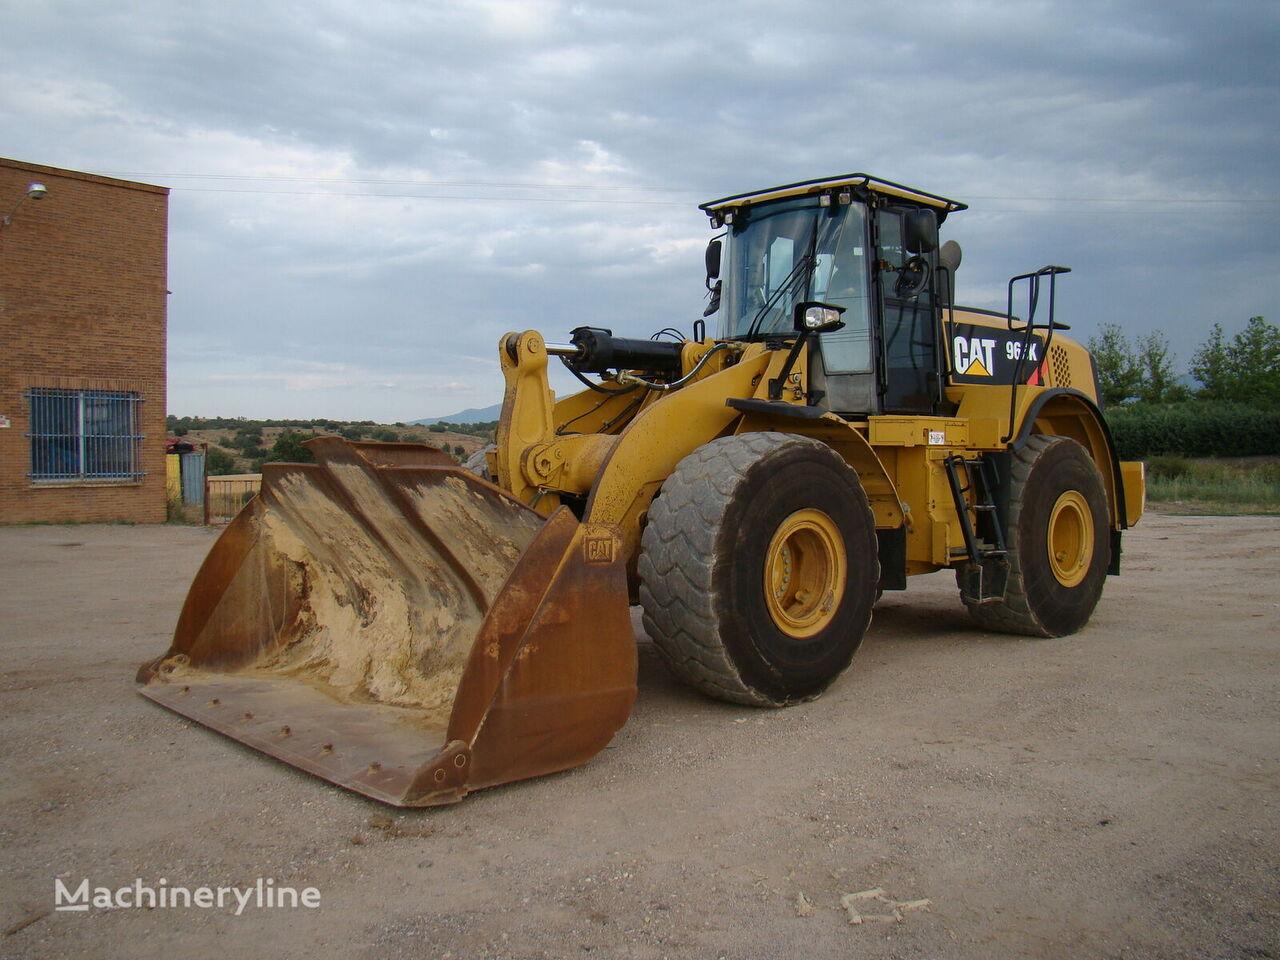 CATERPILLAR 966 K cargadora de ruedas